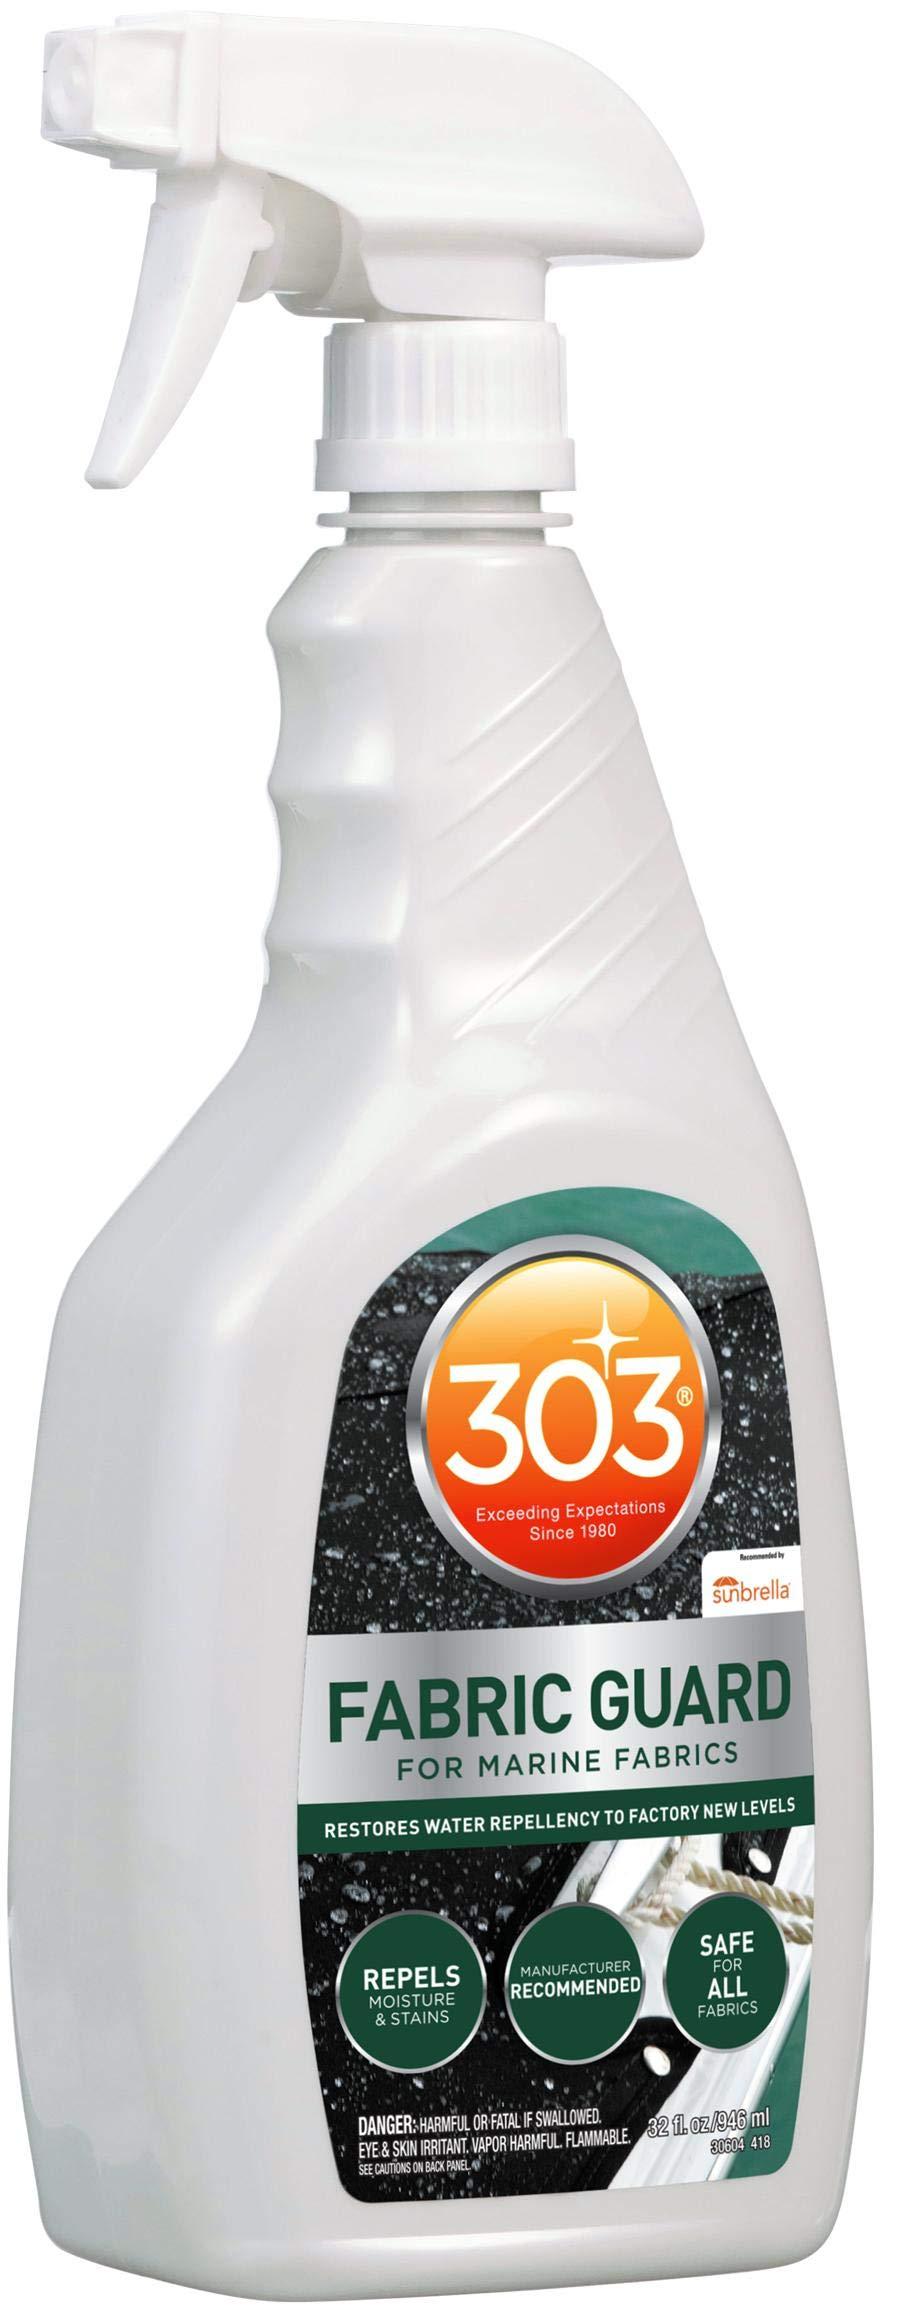 303 30604CSR (30604) Fabric Guard Trigger Sprayer, 32 Fl. oz. by 303 Products (Image #9)